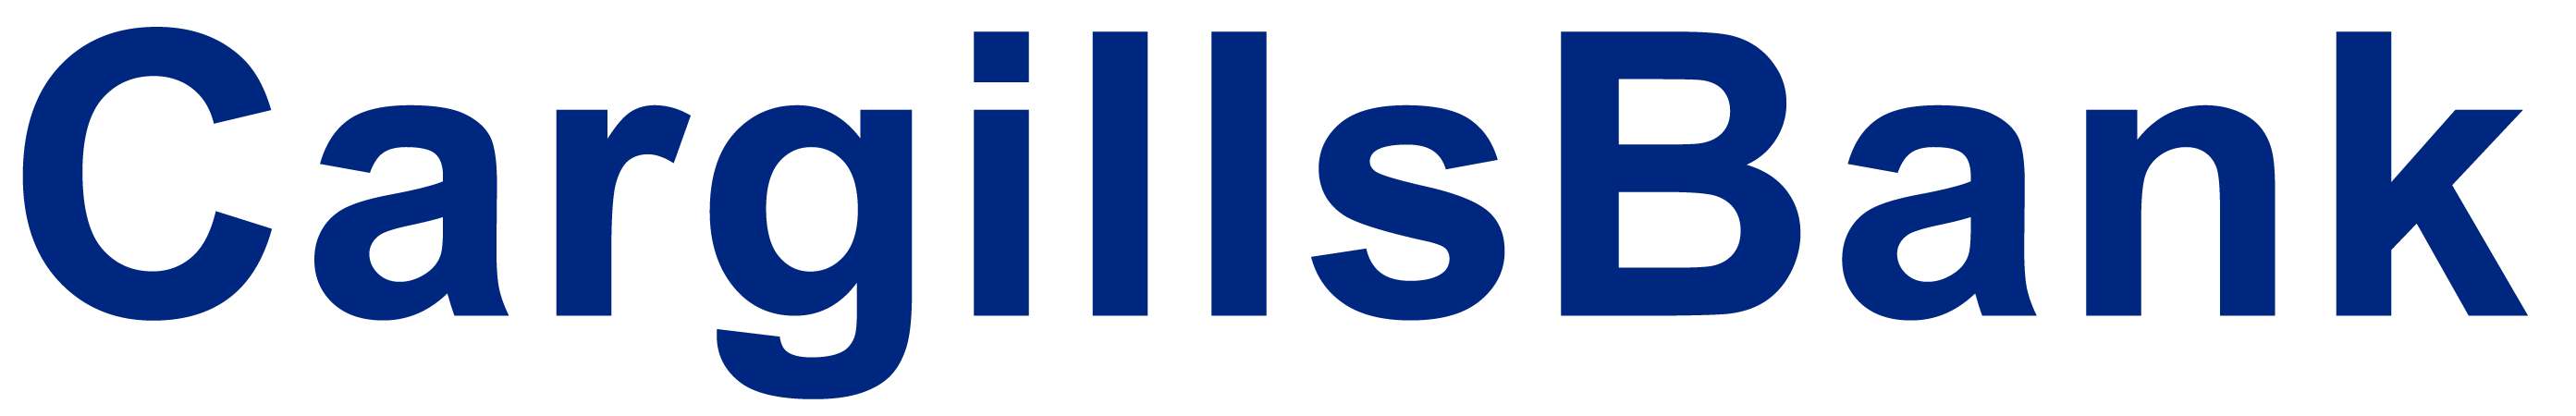 Cargills Bank & Food Stores